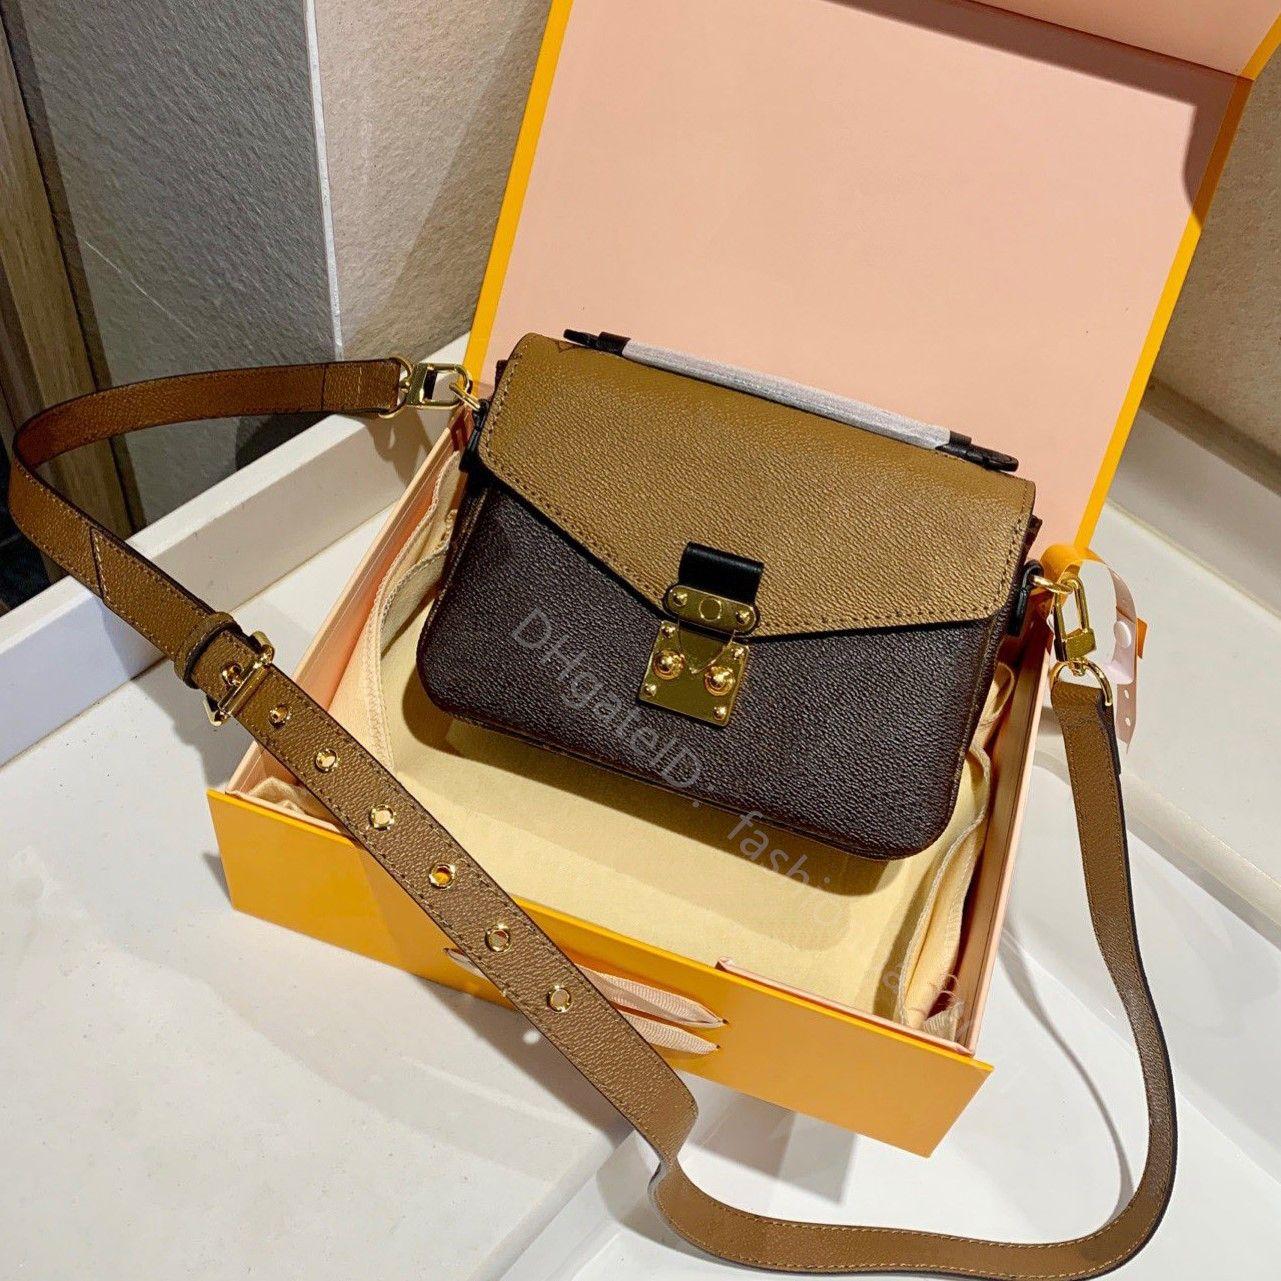 2021 SS عالية الجودة سيدة الأزياء حقيبة مصمم الفاخرة حقائب أنيقة والمنخفضة مفتاح مظهر تصميم ميتيس حقيبة الكتف حقائب الكتف الصليب الجسم